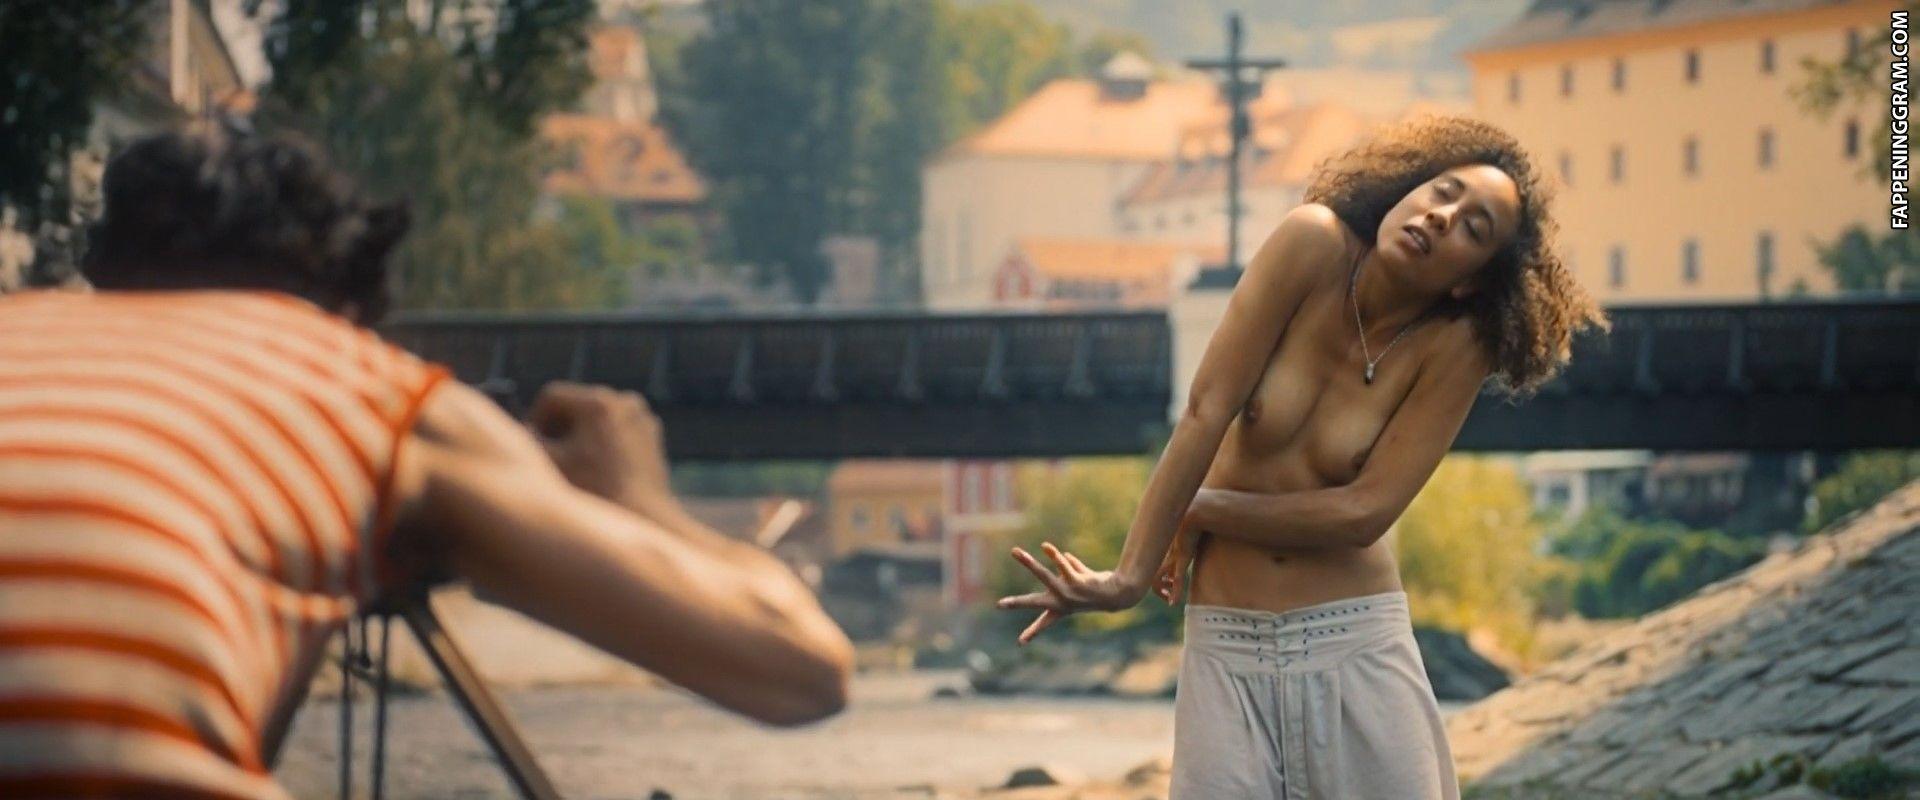 Larissa Breidbach Nude